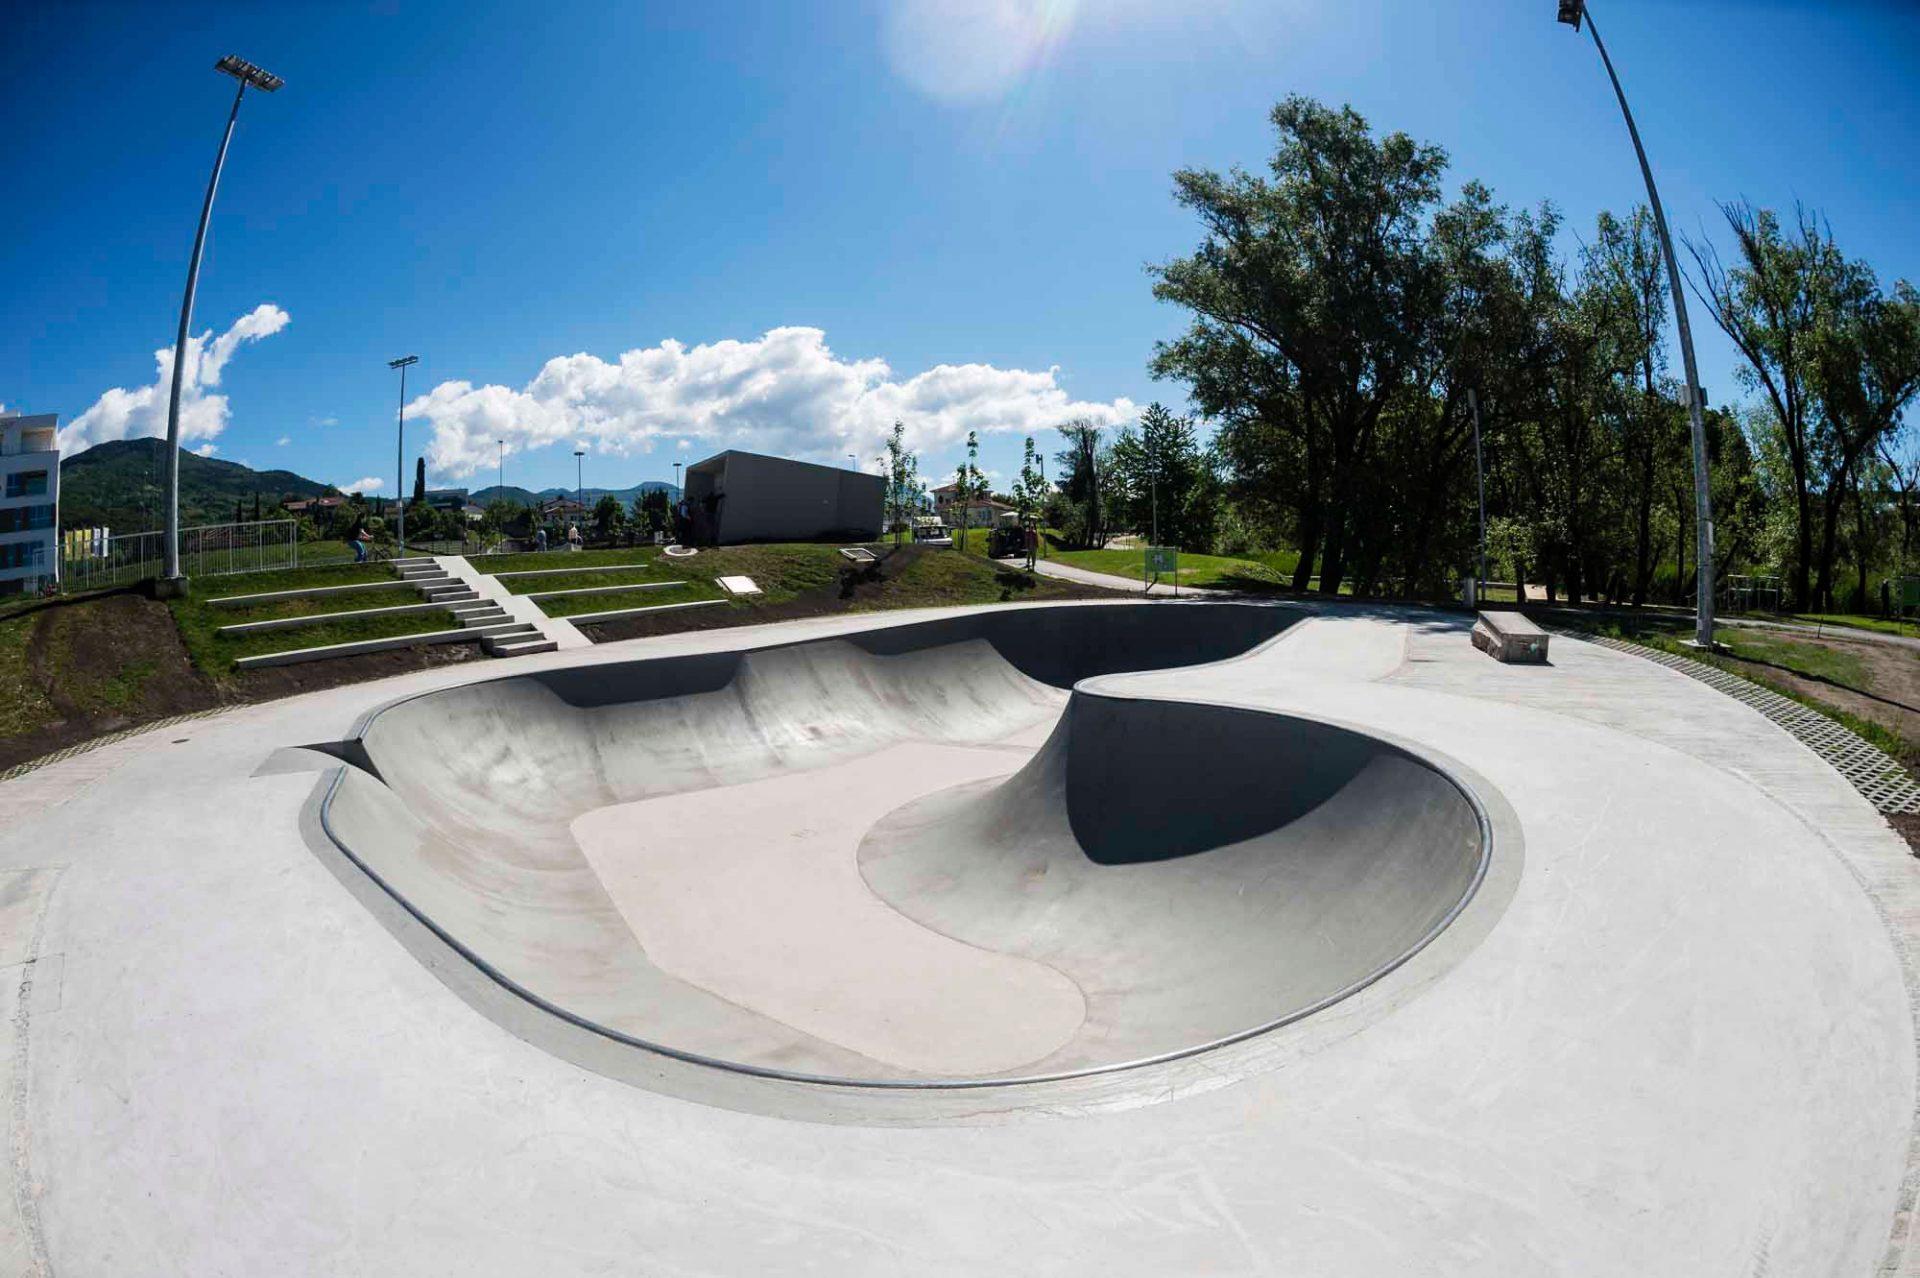 news_nova_gorika_Skate_Park_4